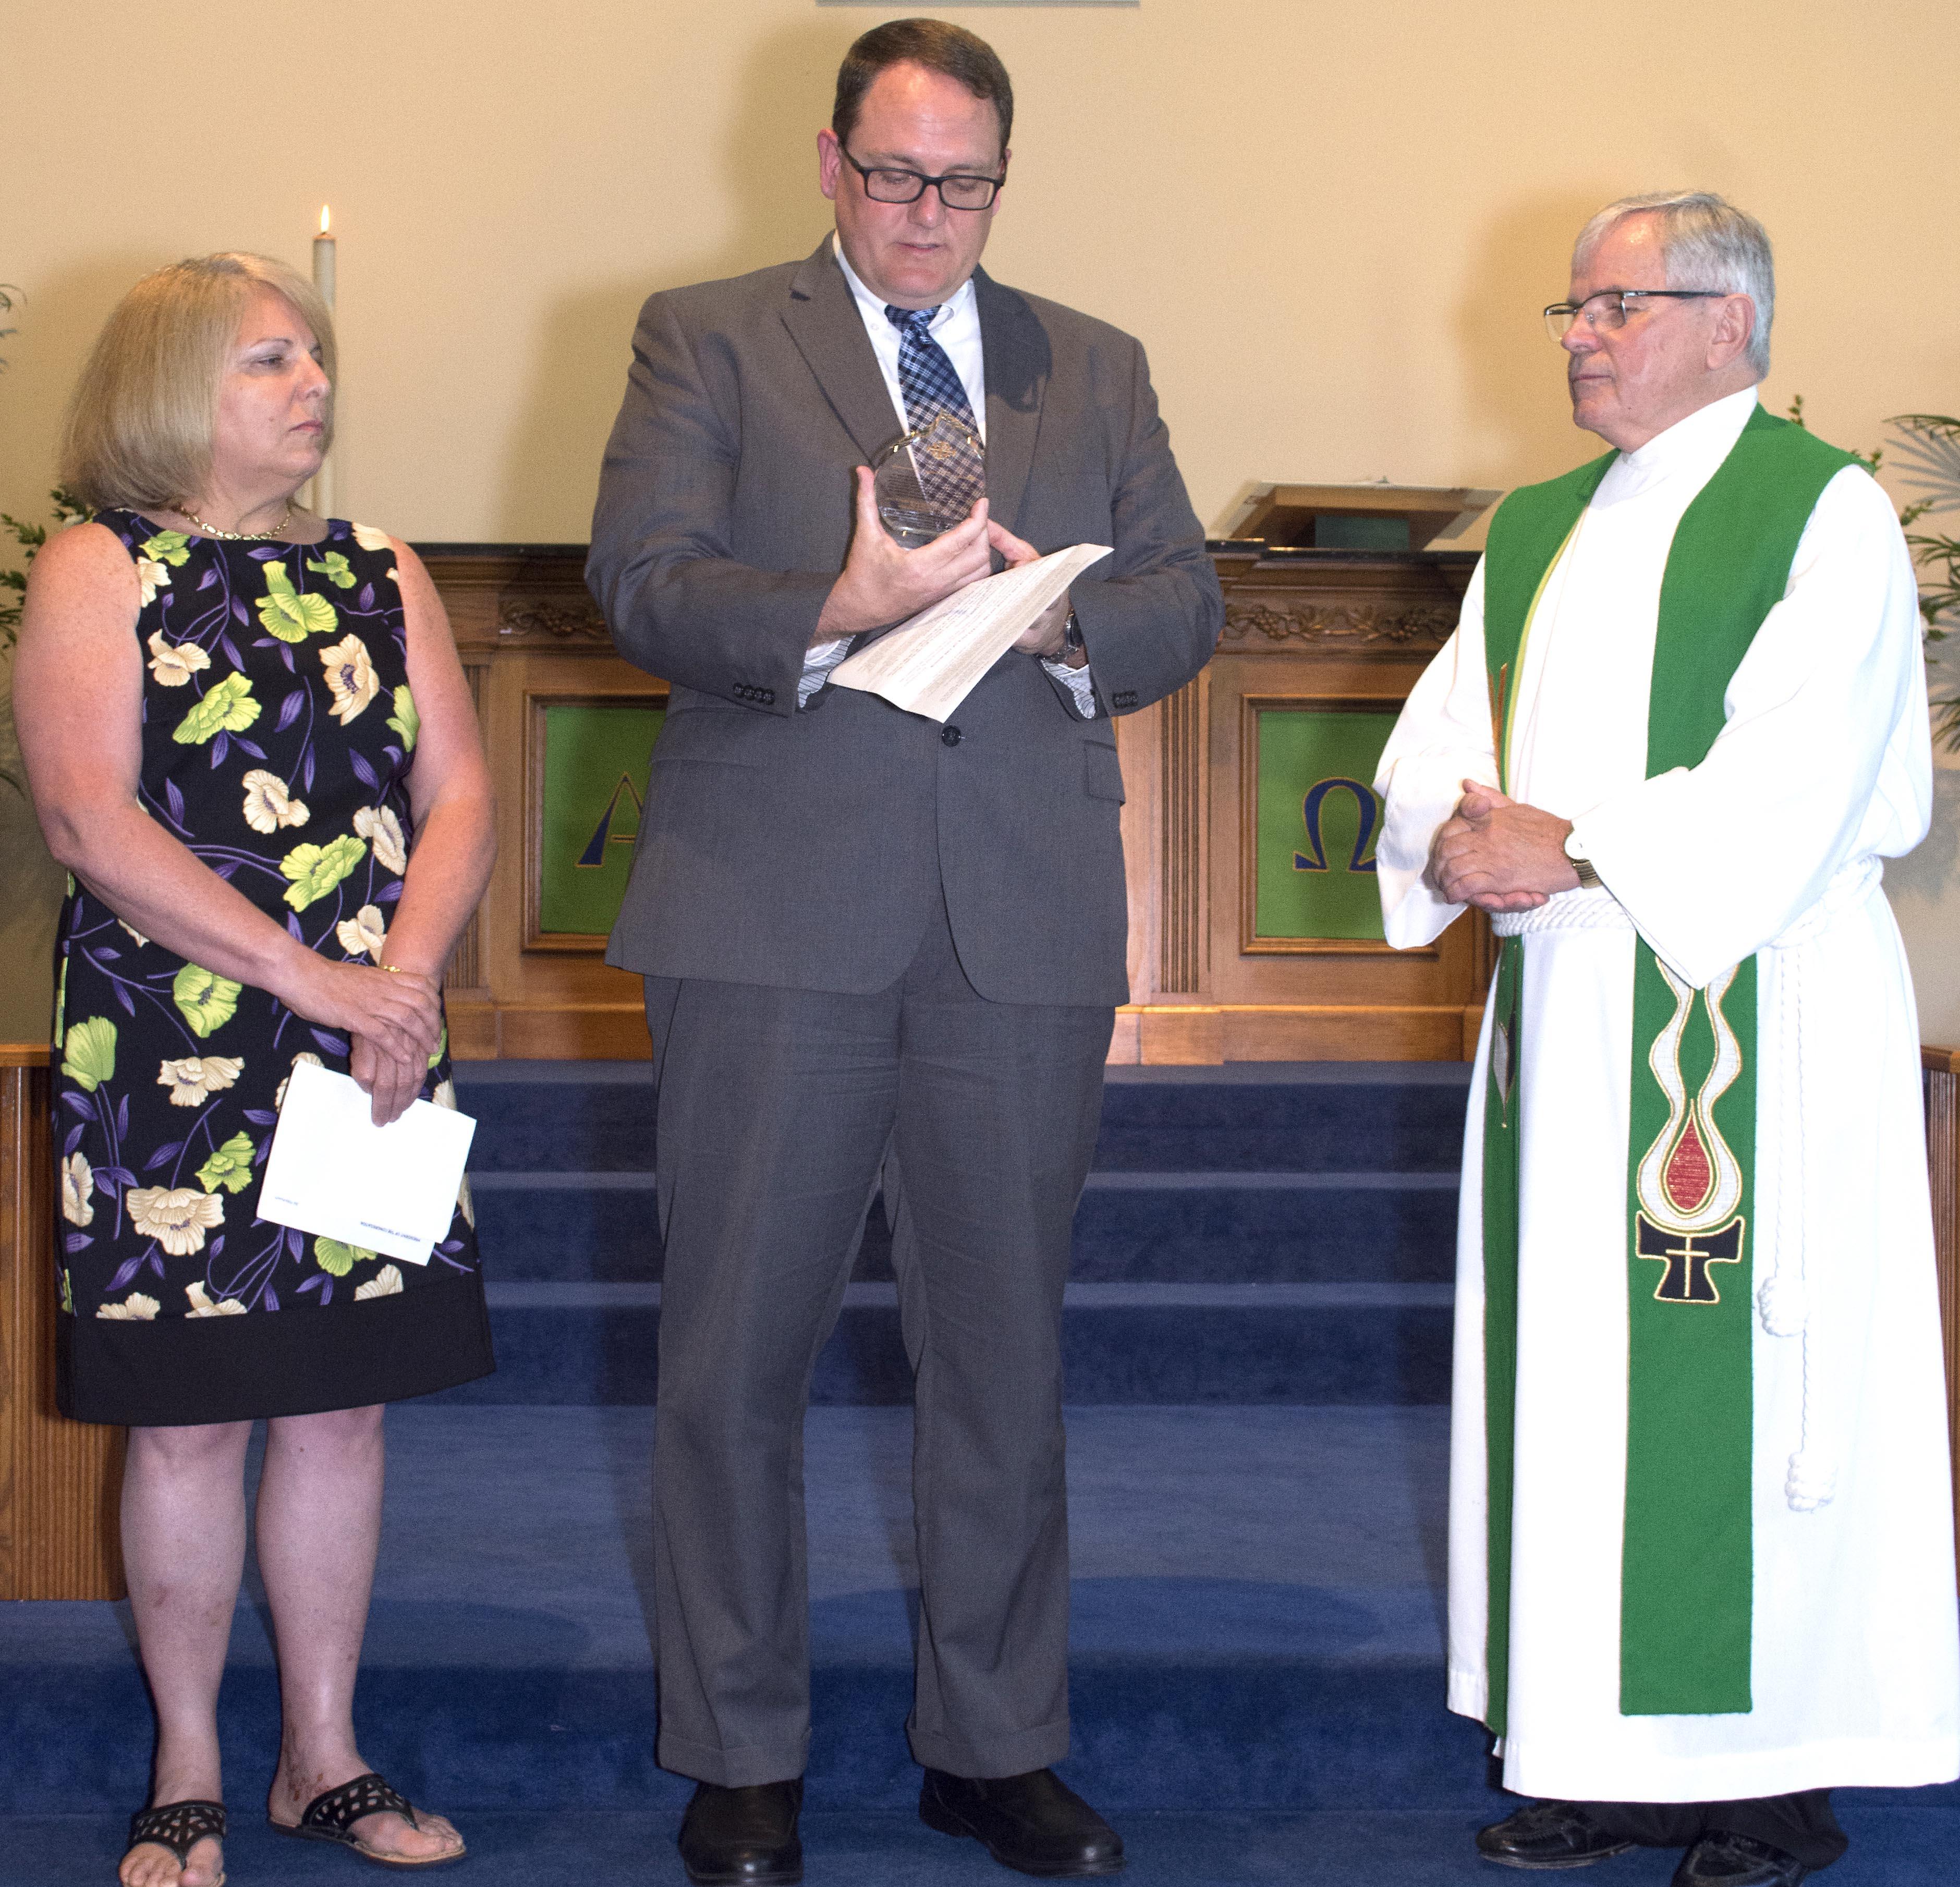 370c1c2975080bbc1acf_38944fe773c860b4206c_Bill_Ritterbusch_and_Kathy_Slater_Present_Pastor_Emeritus_Award_to_Reverend_Kennedy.jpg